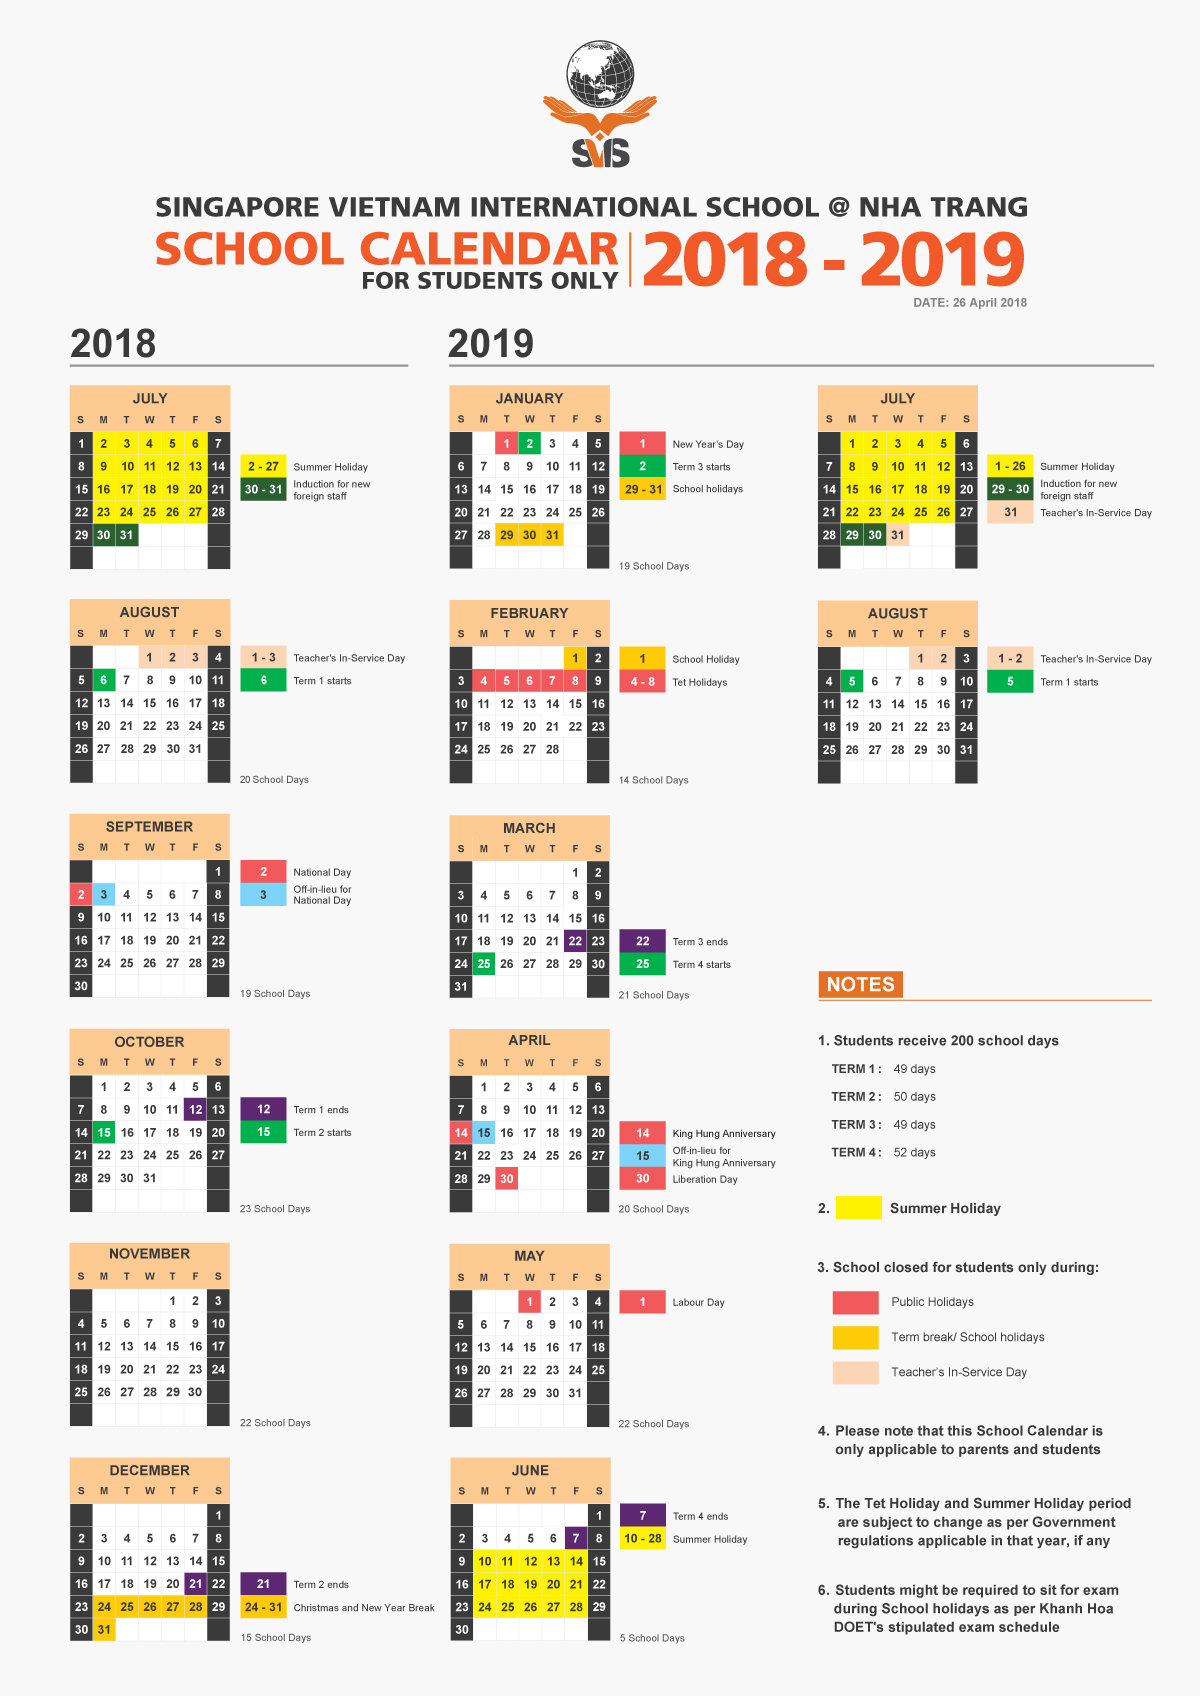 School-Calendar-2018-2019_SVIS_NT-new